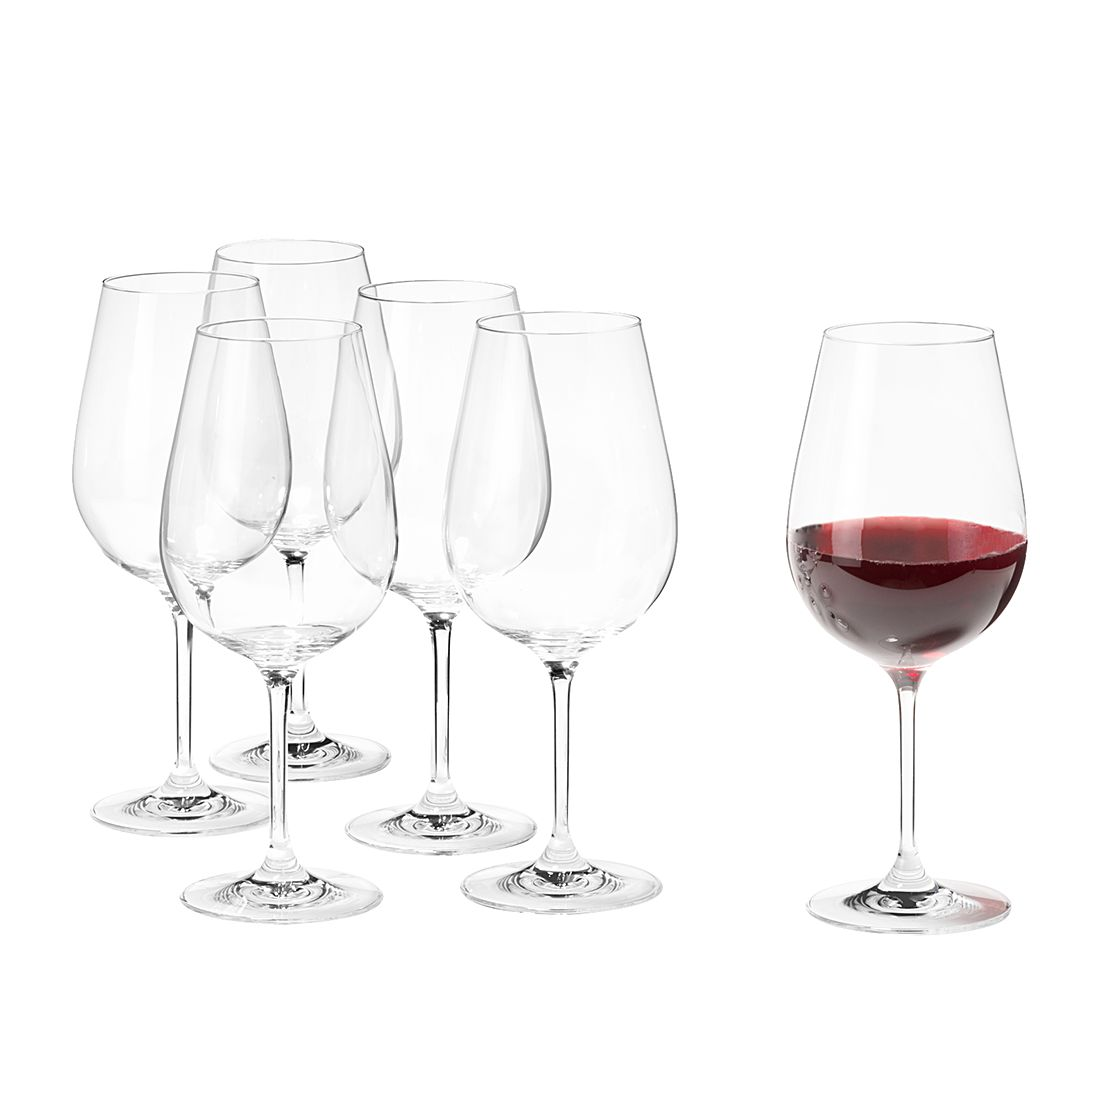 Weinglas XL Tivoli (6er-Set) - Klar, Leonardo